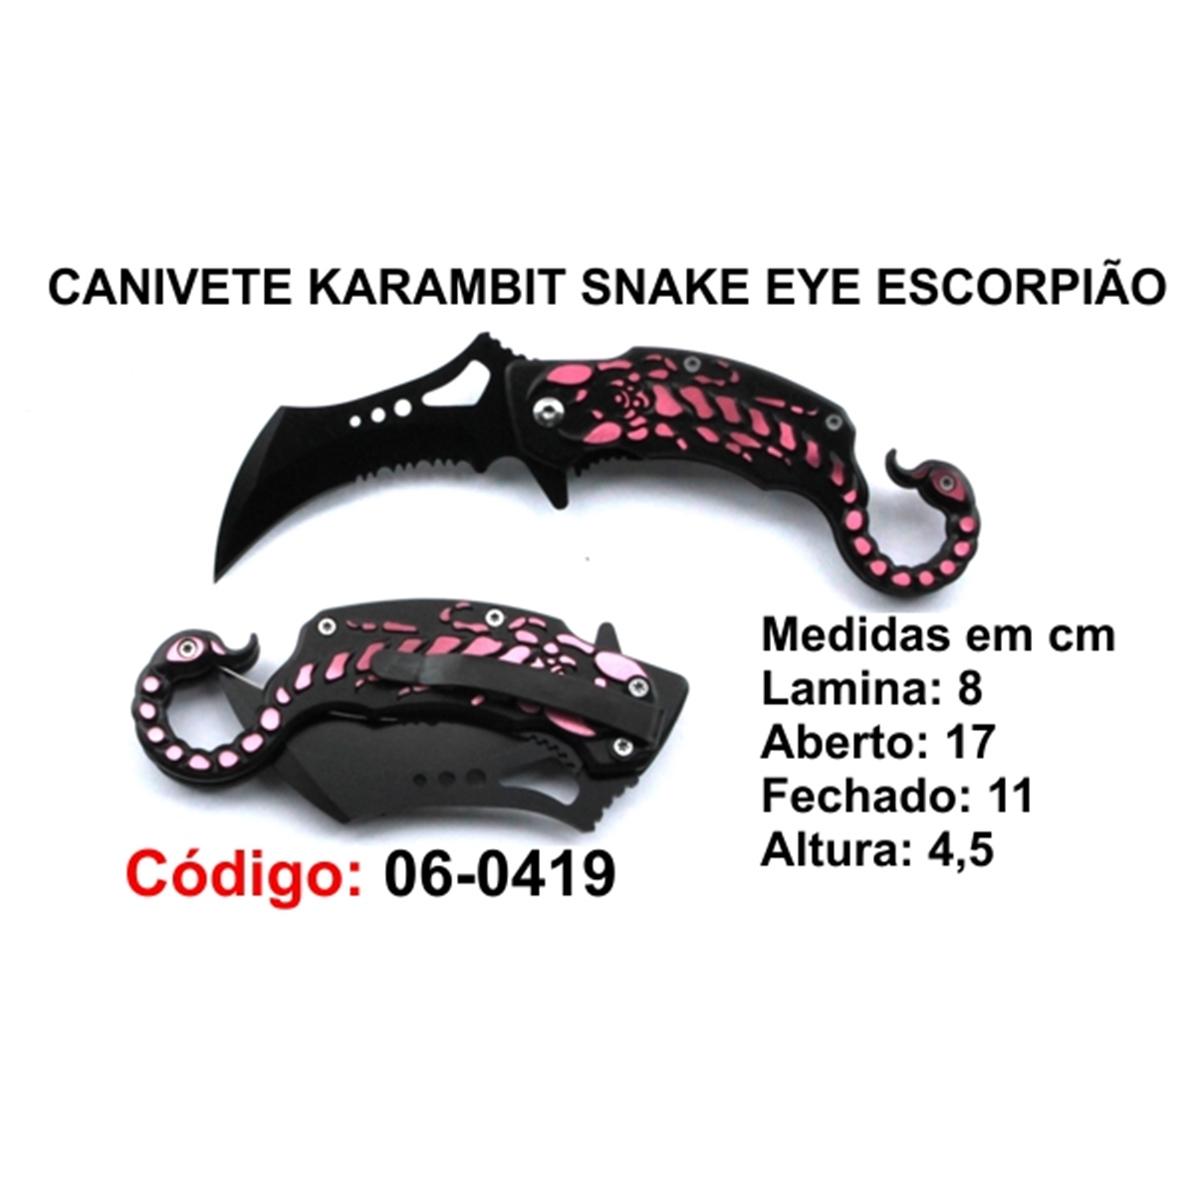 Canivete Karambit Snake EYE Caça Pesca Etc. 06-0419